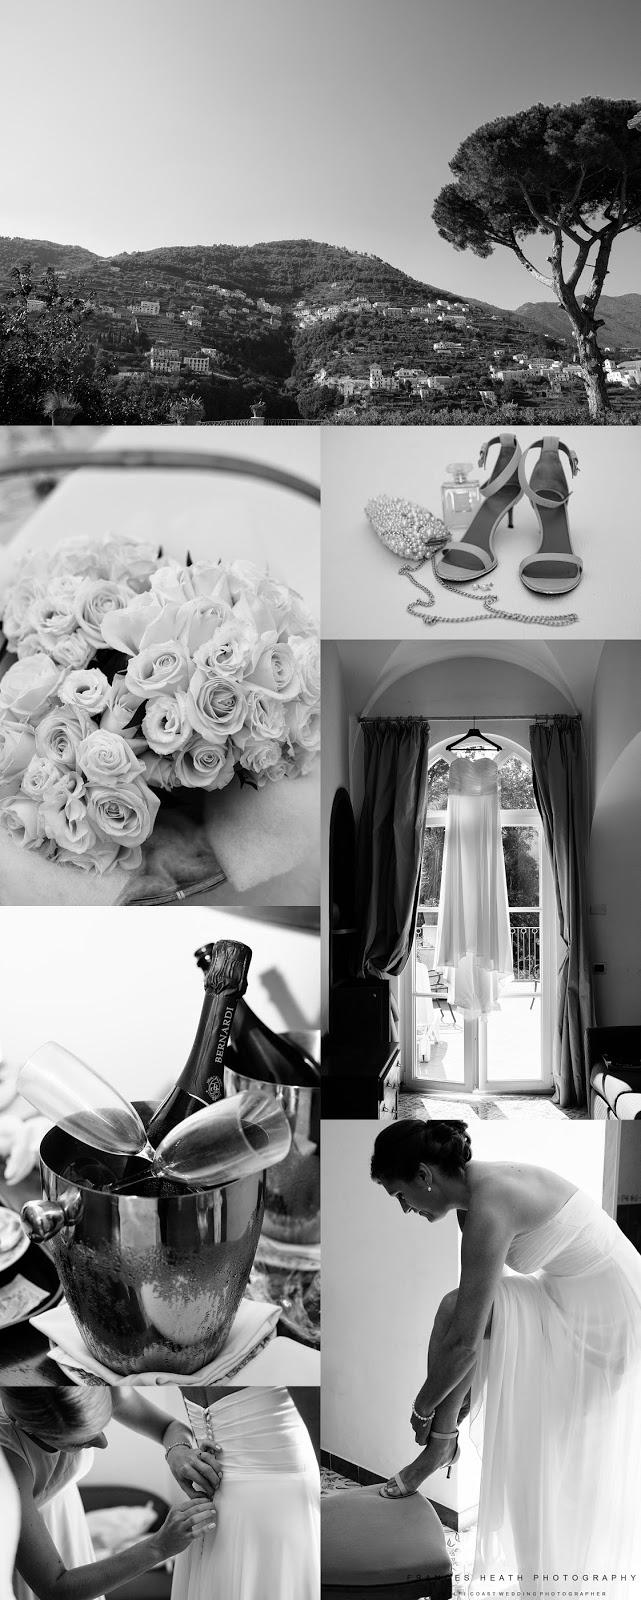 Bridal preparations at Hotel Giordano in Ravello